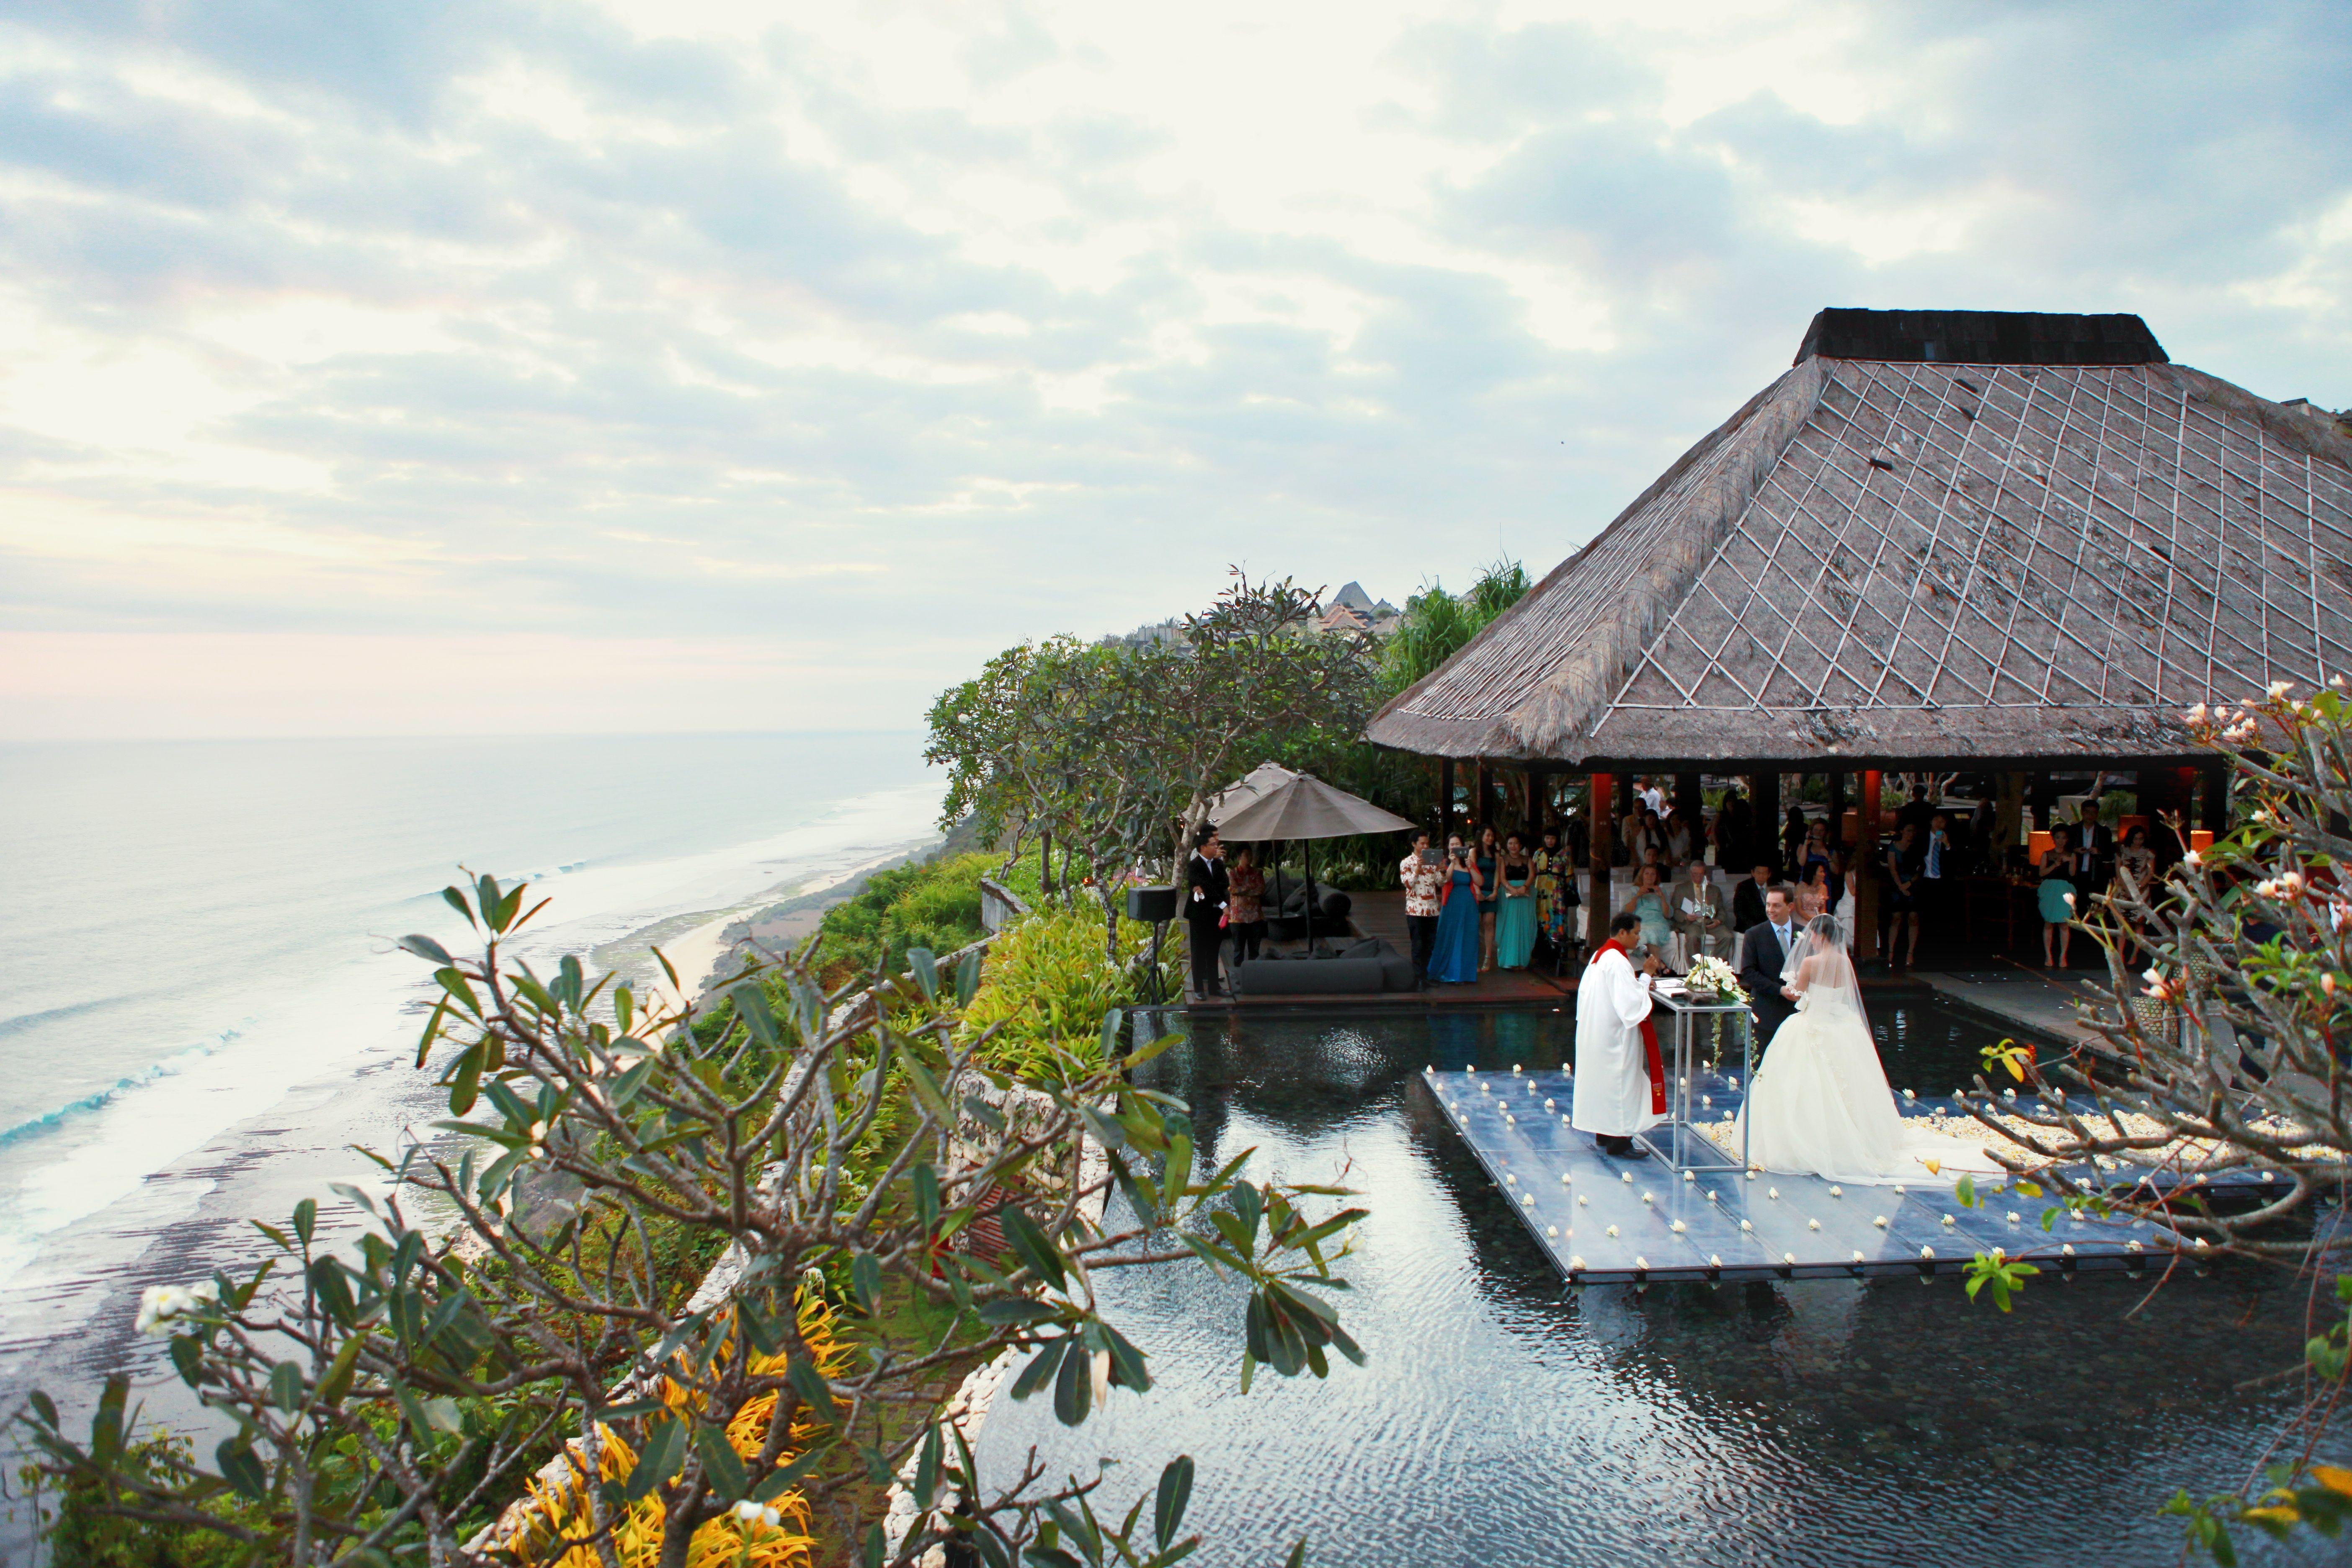 Wedding Venue Bvlgari, Bali, Indonesialove• Where to